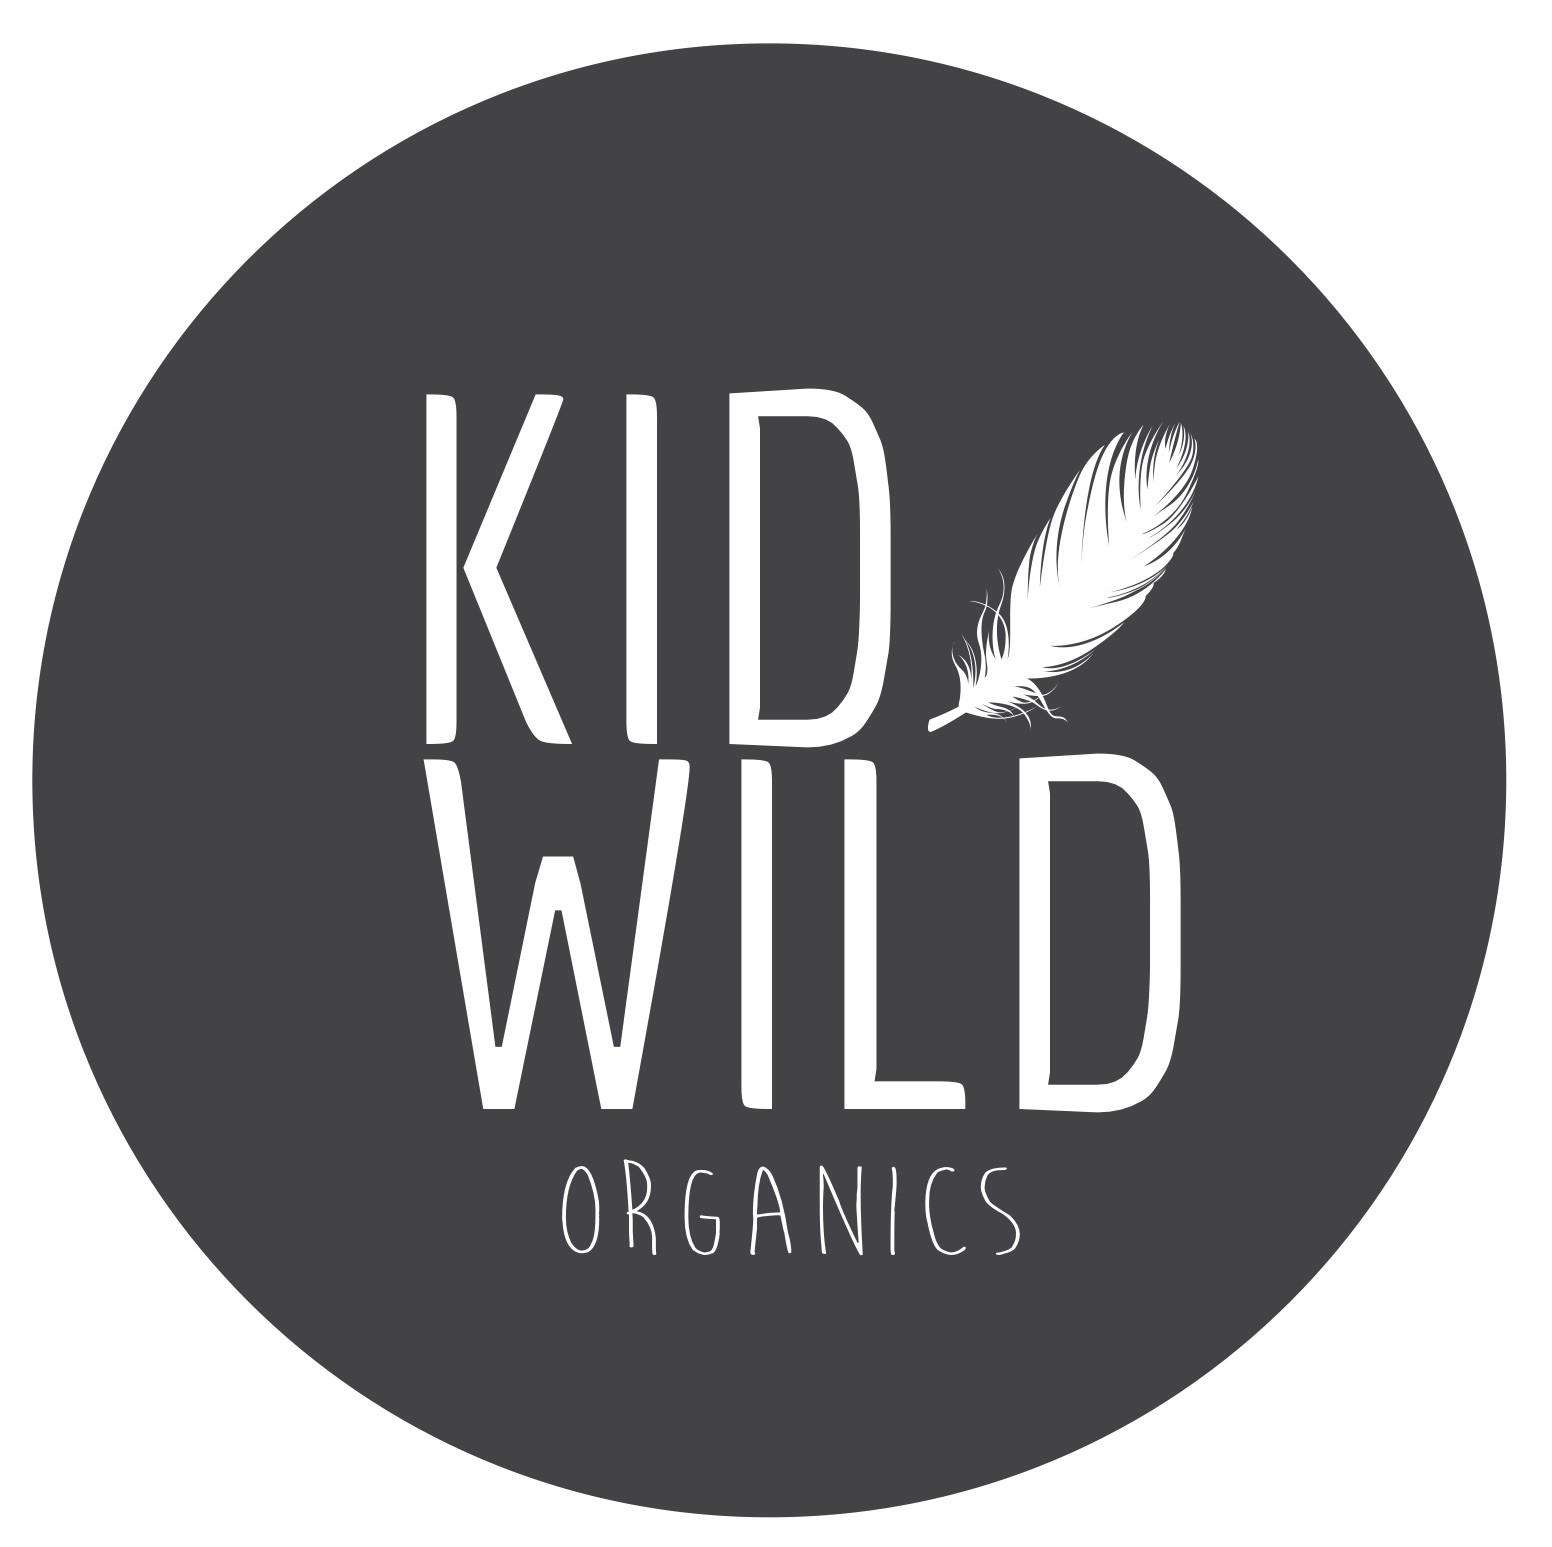 KidWild